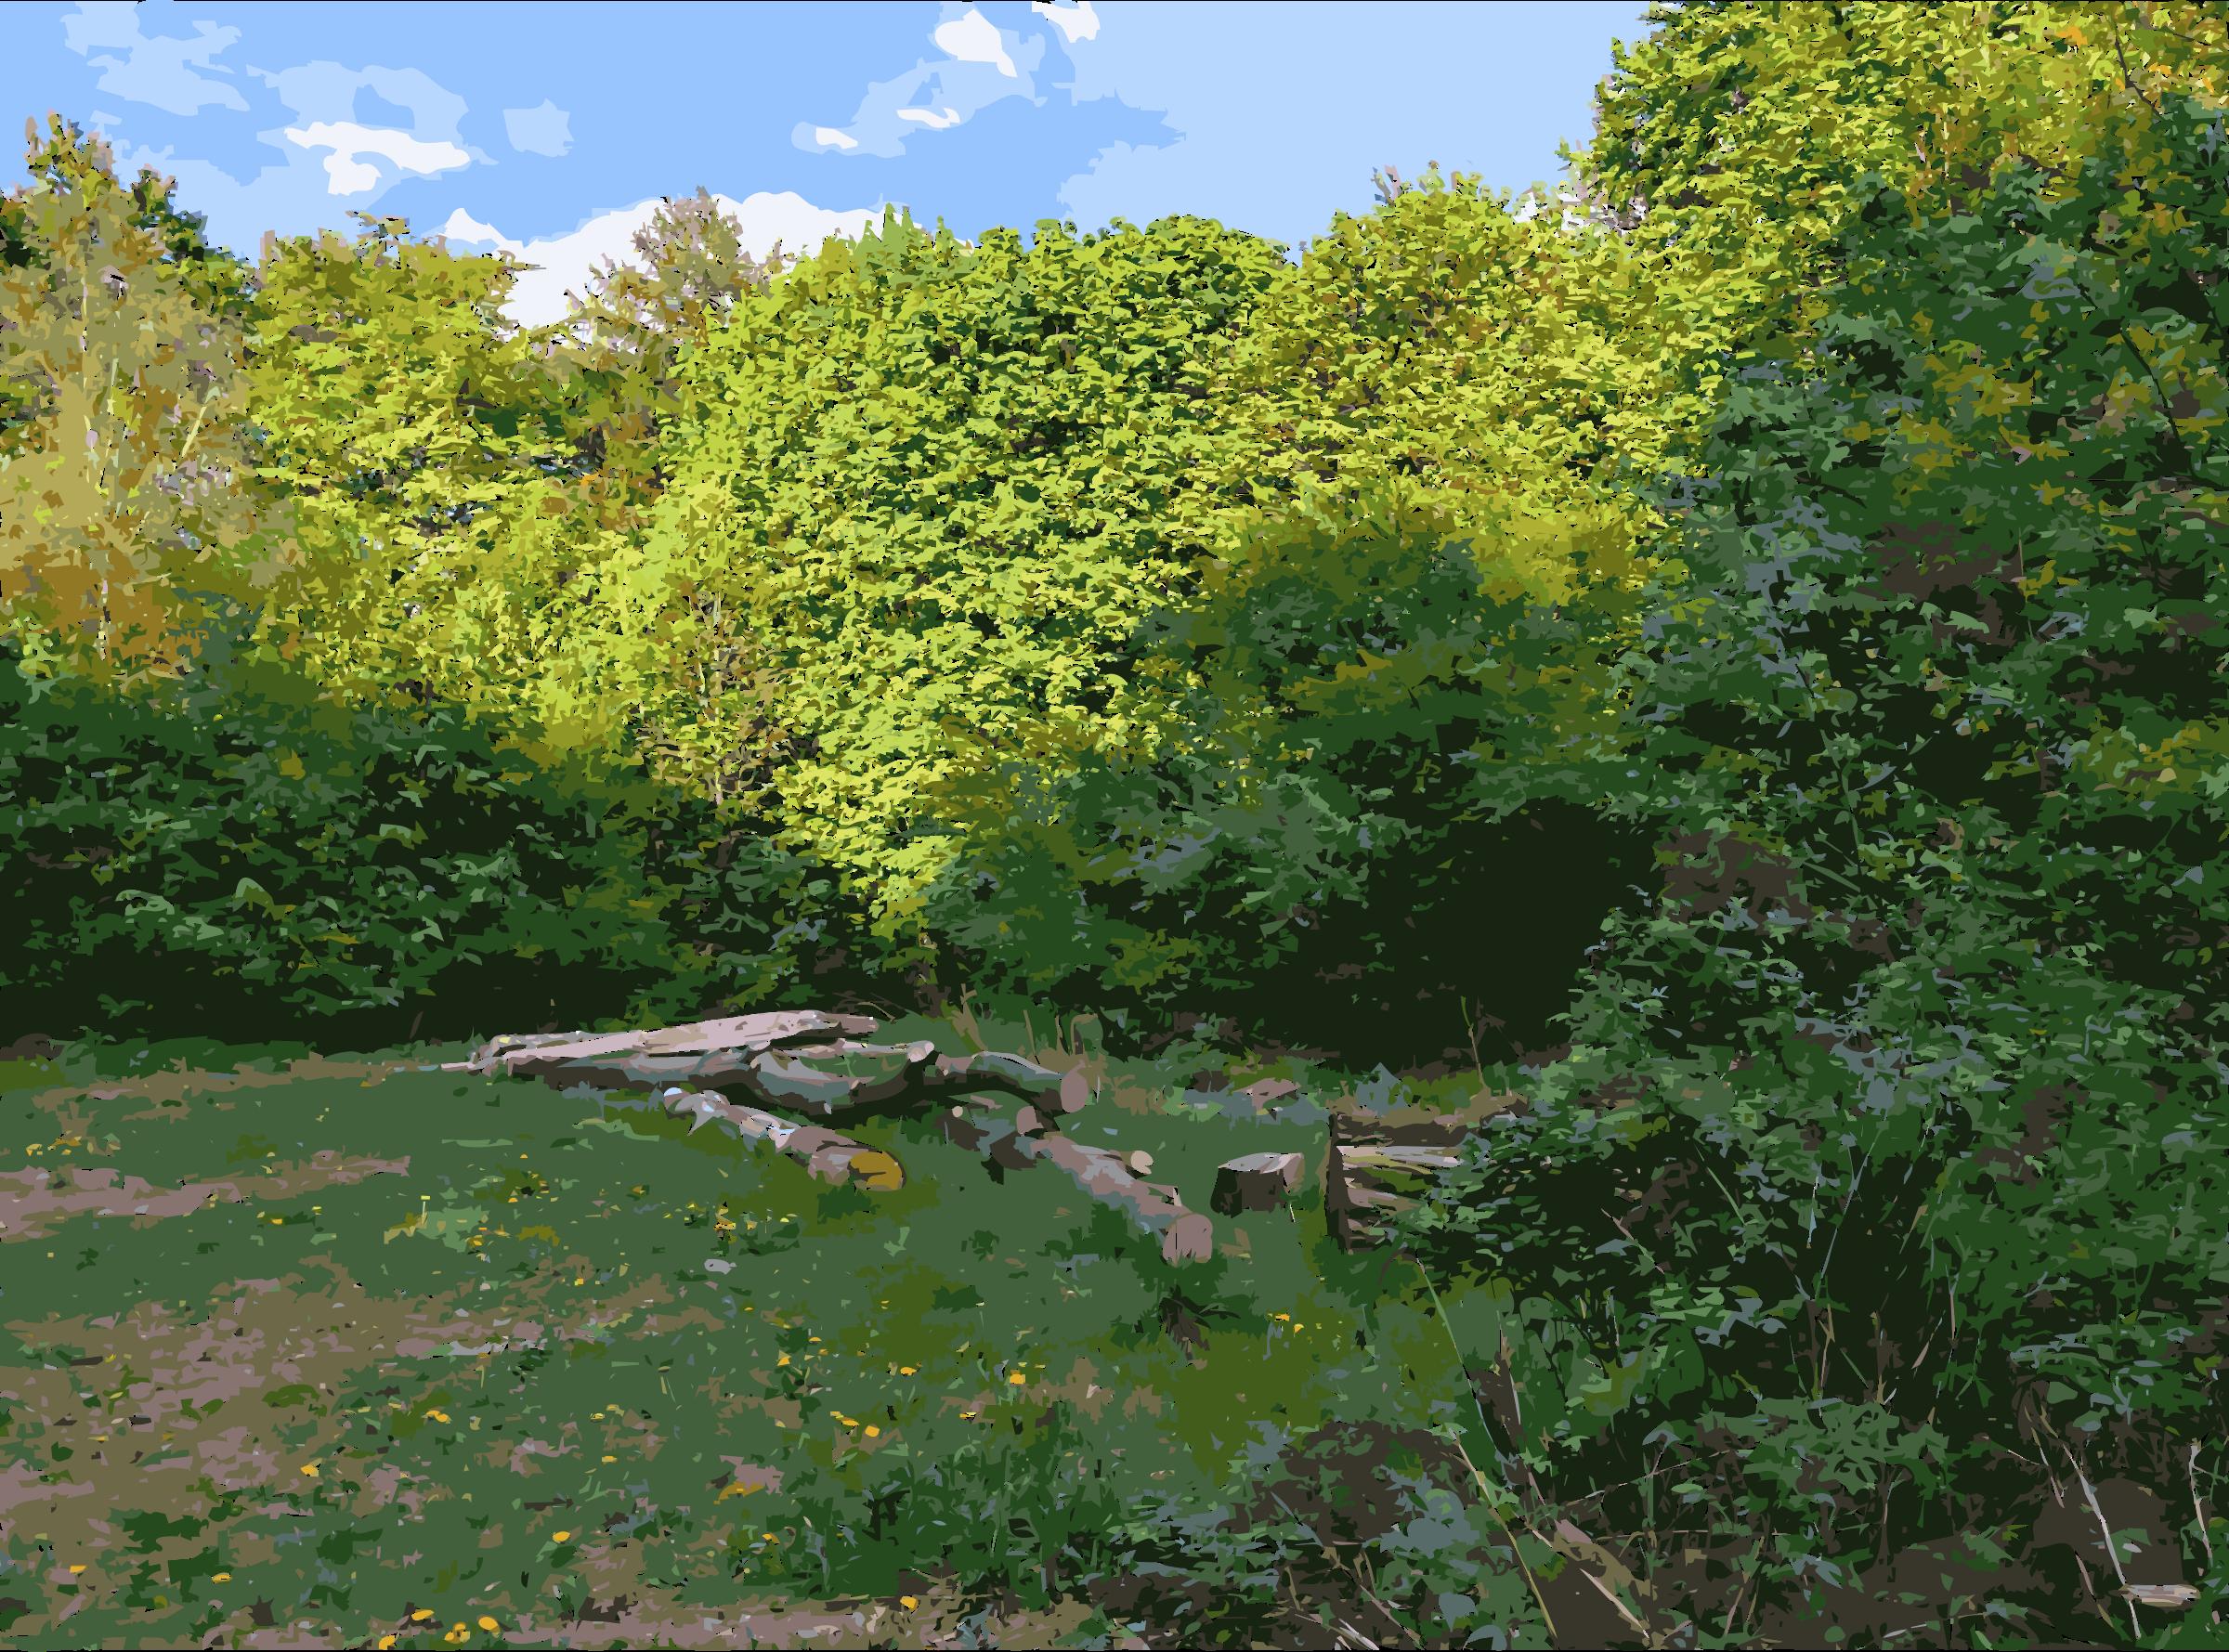 Lichtscheid again big image. Clipart forest landscape